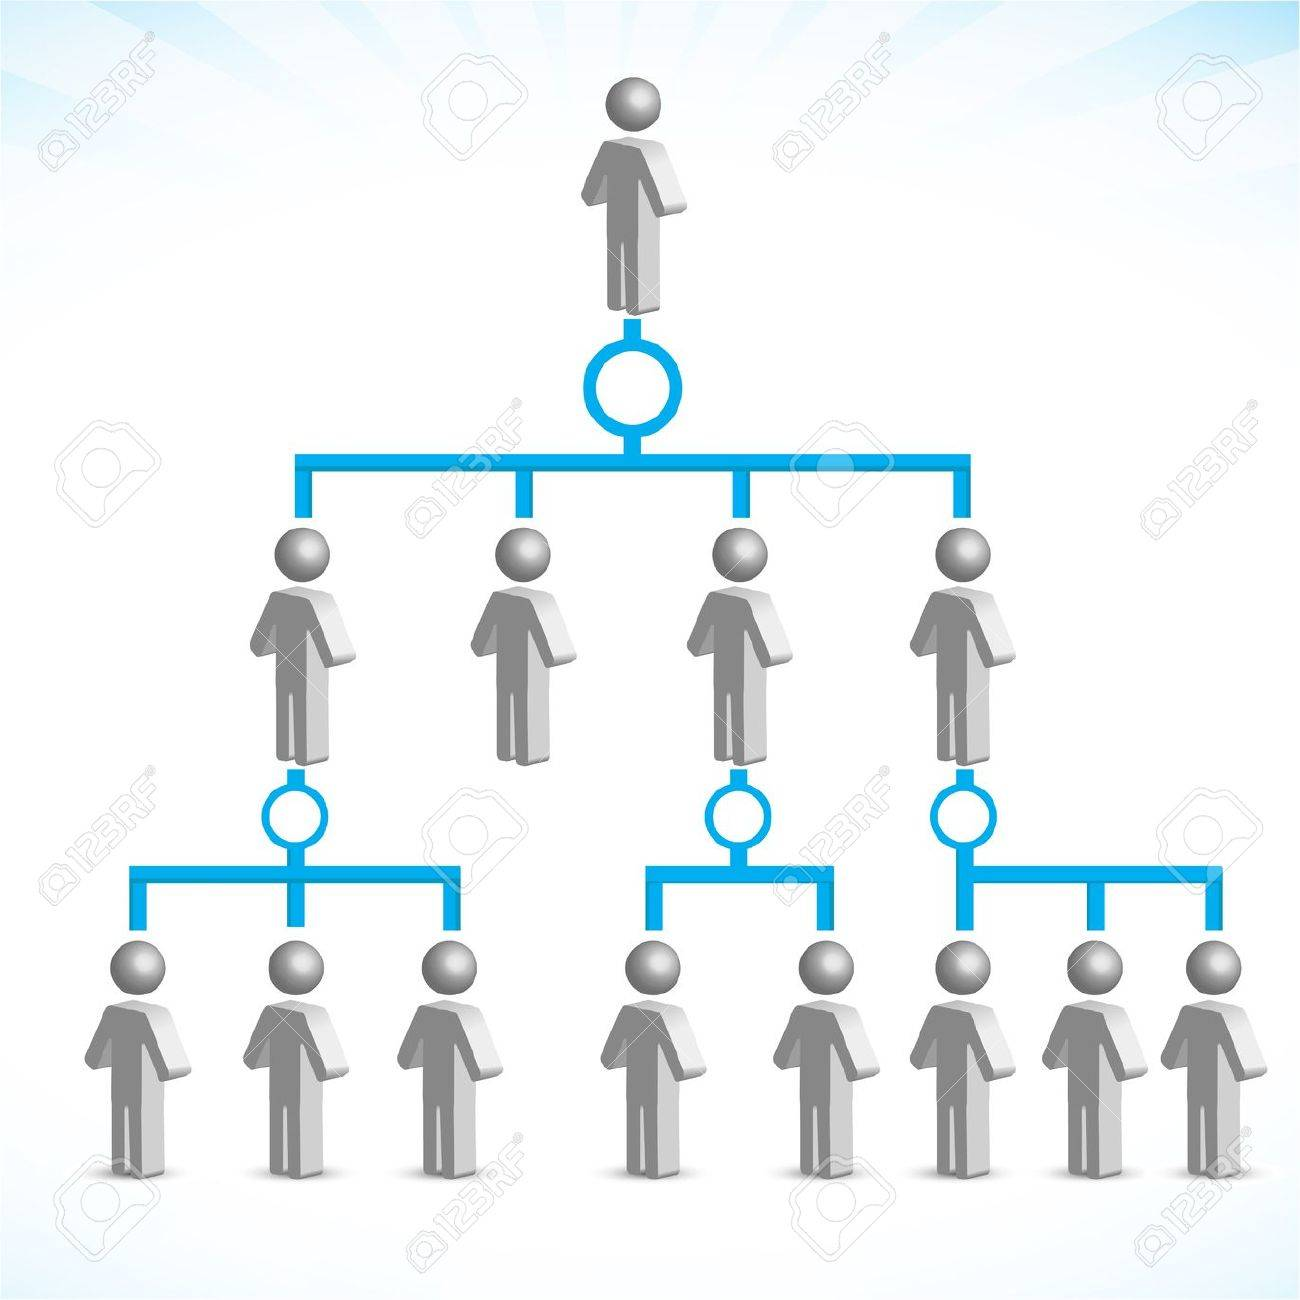 illustration of networking on white background - 9438609